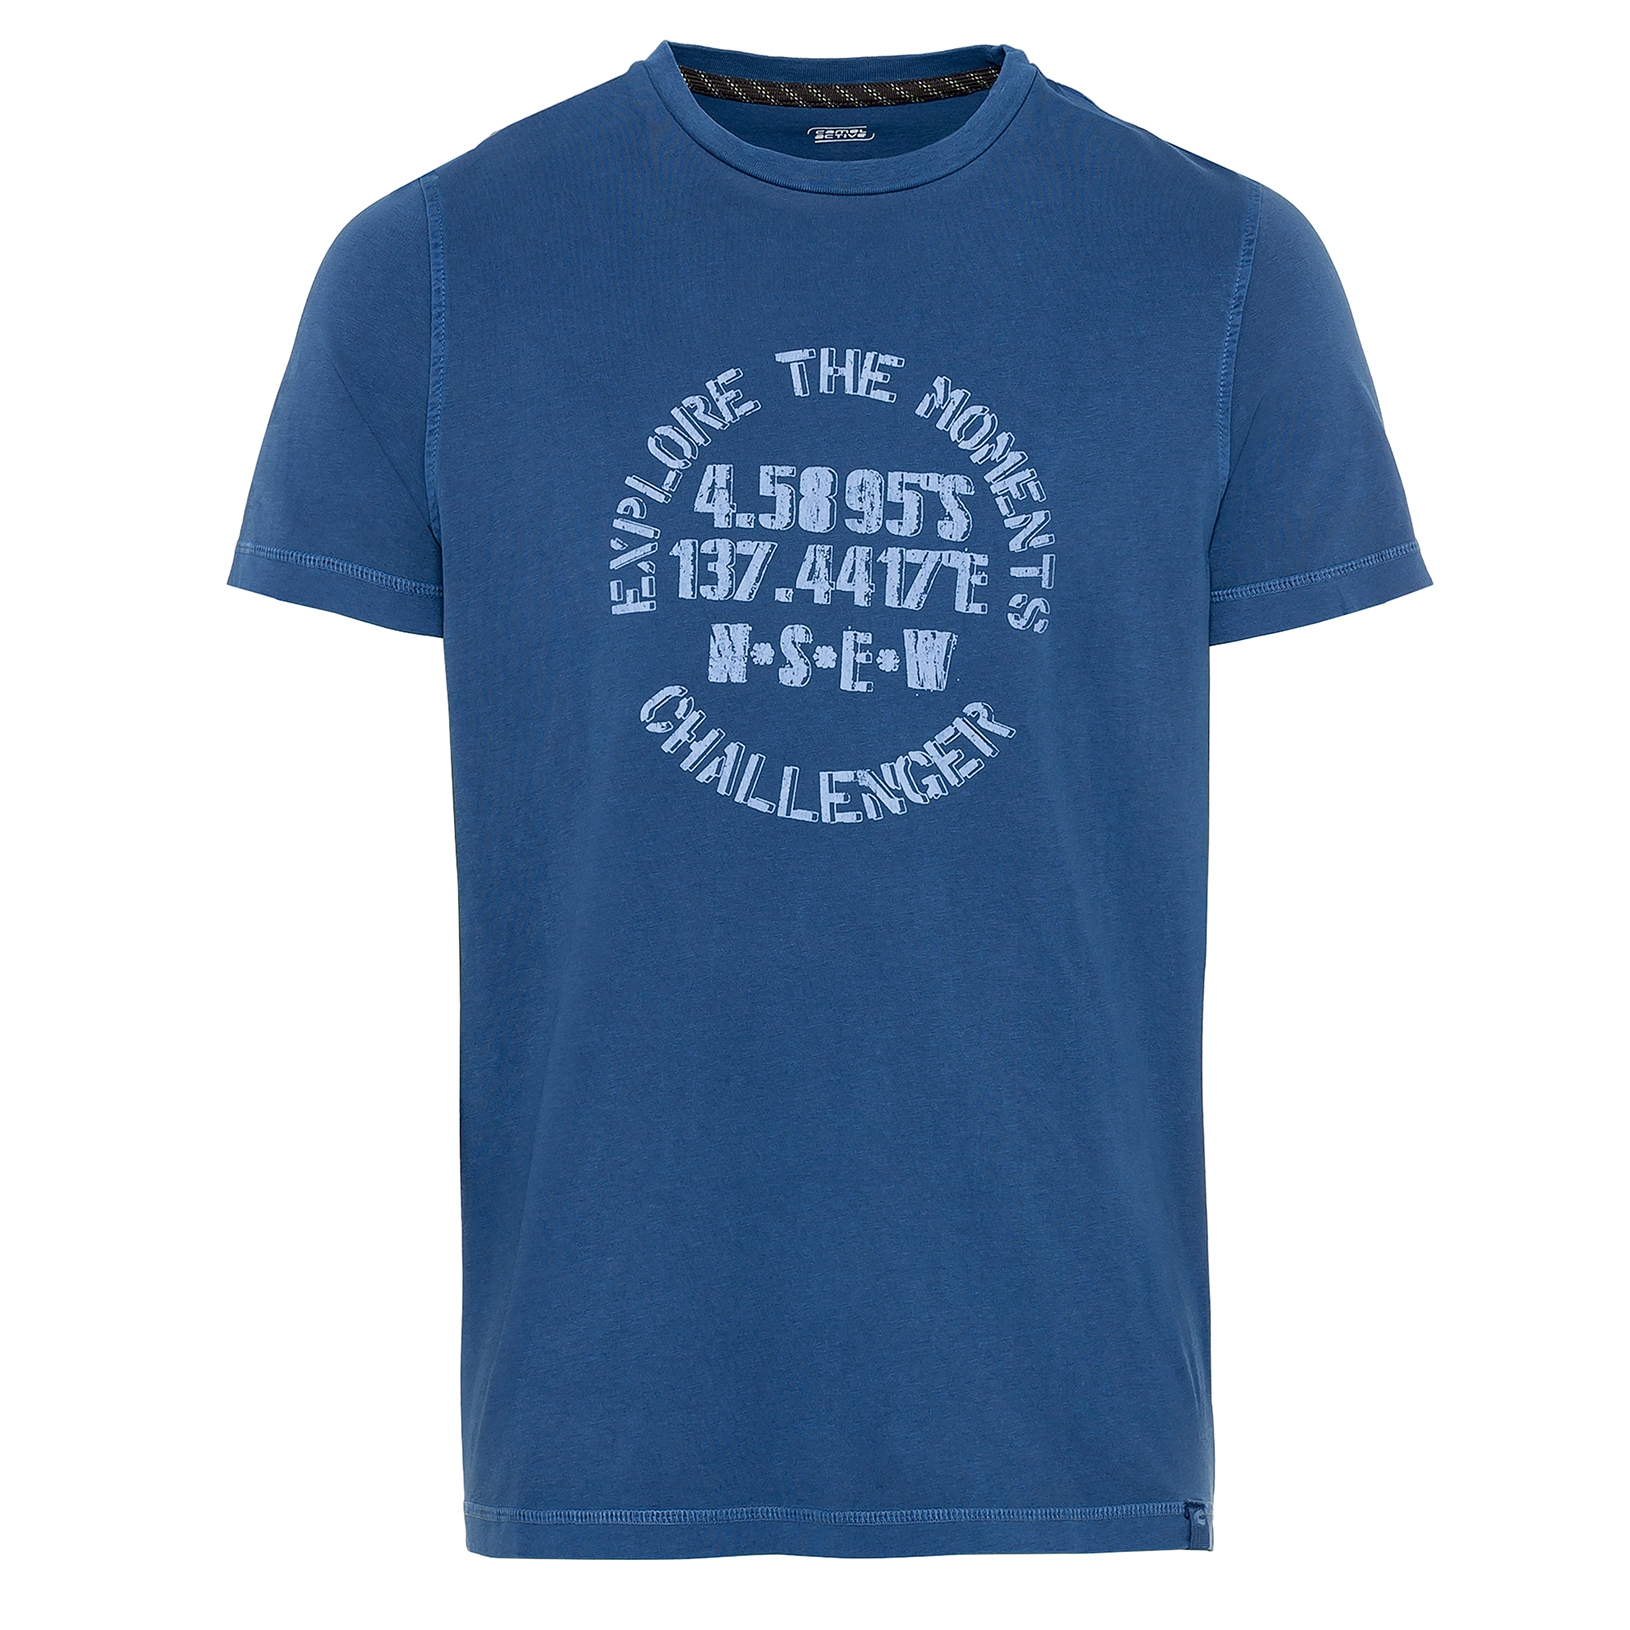 Camel active Herren T-Shirt Shirt kurzarm blau Print 5T46409646 46